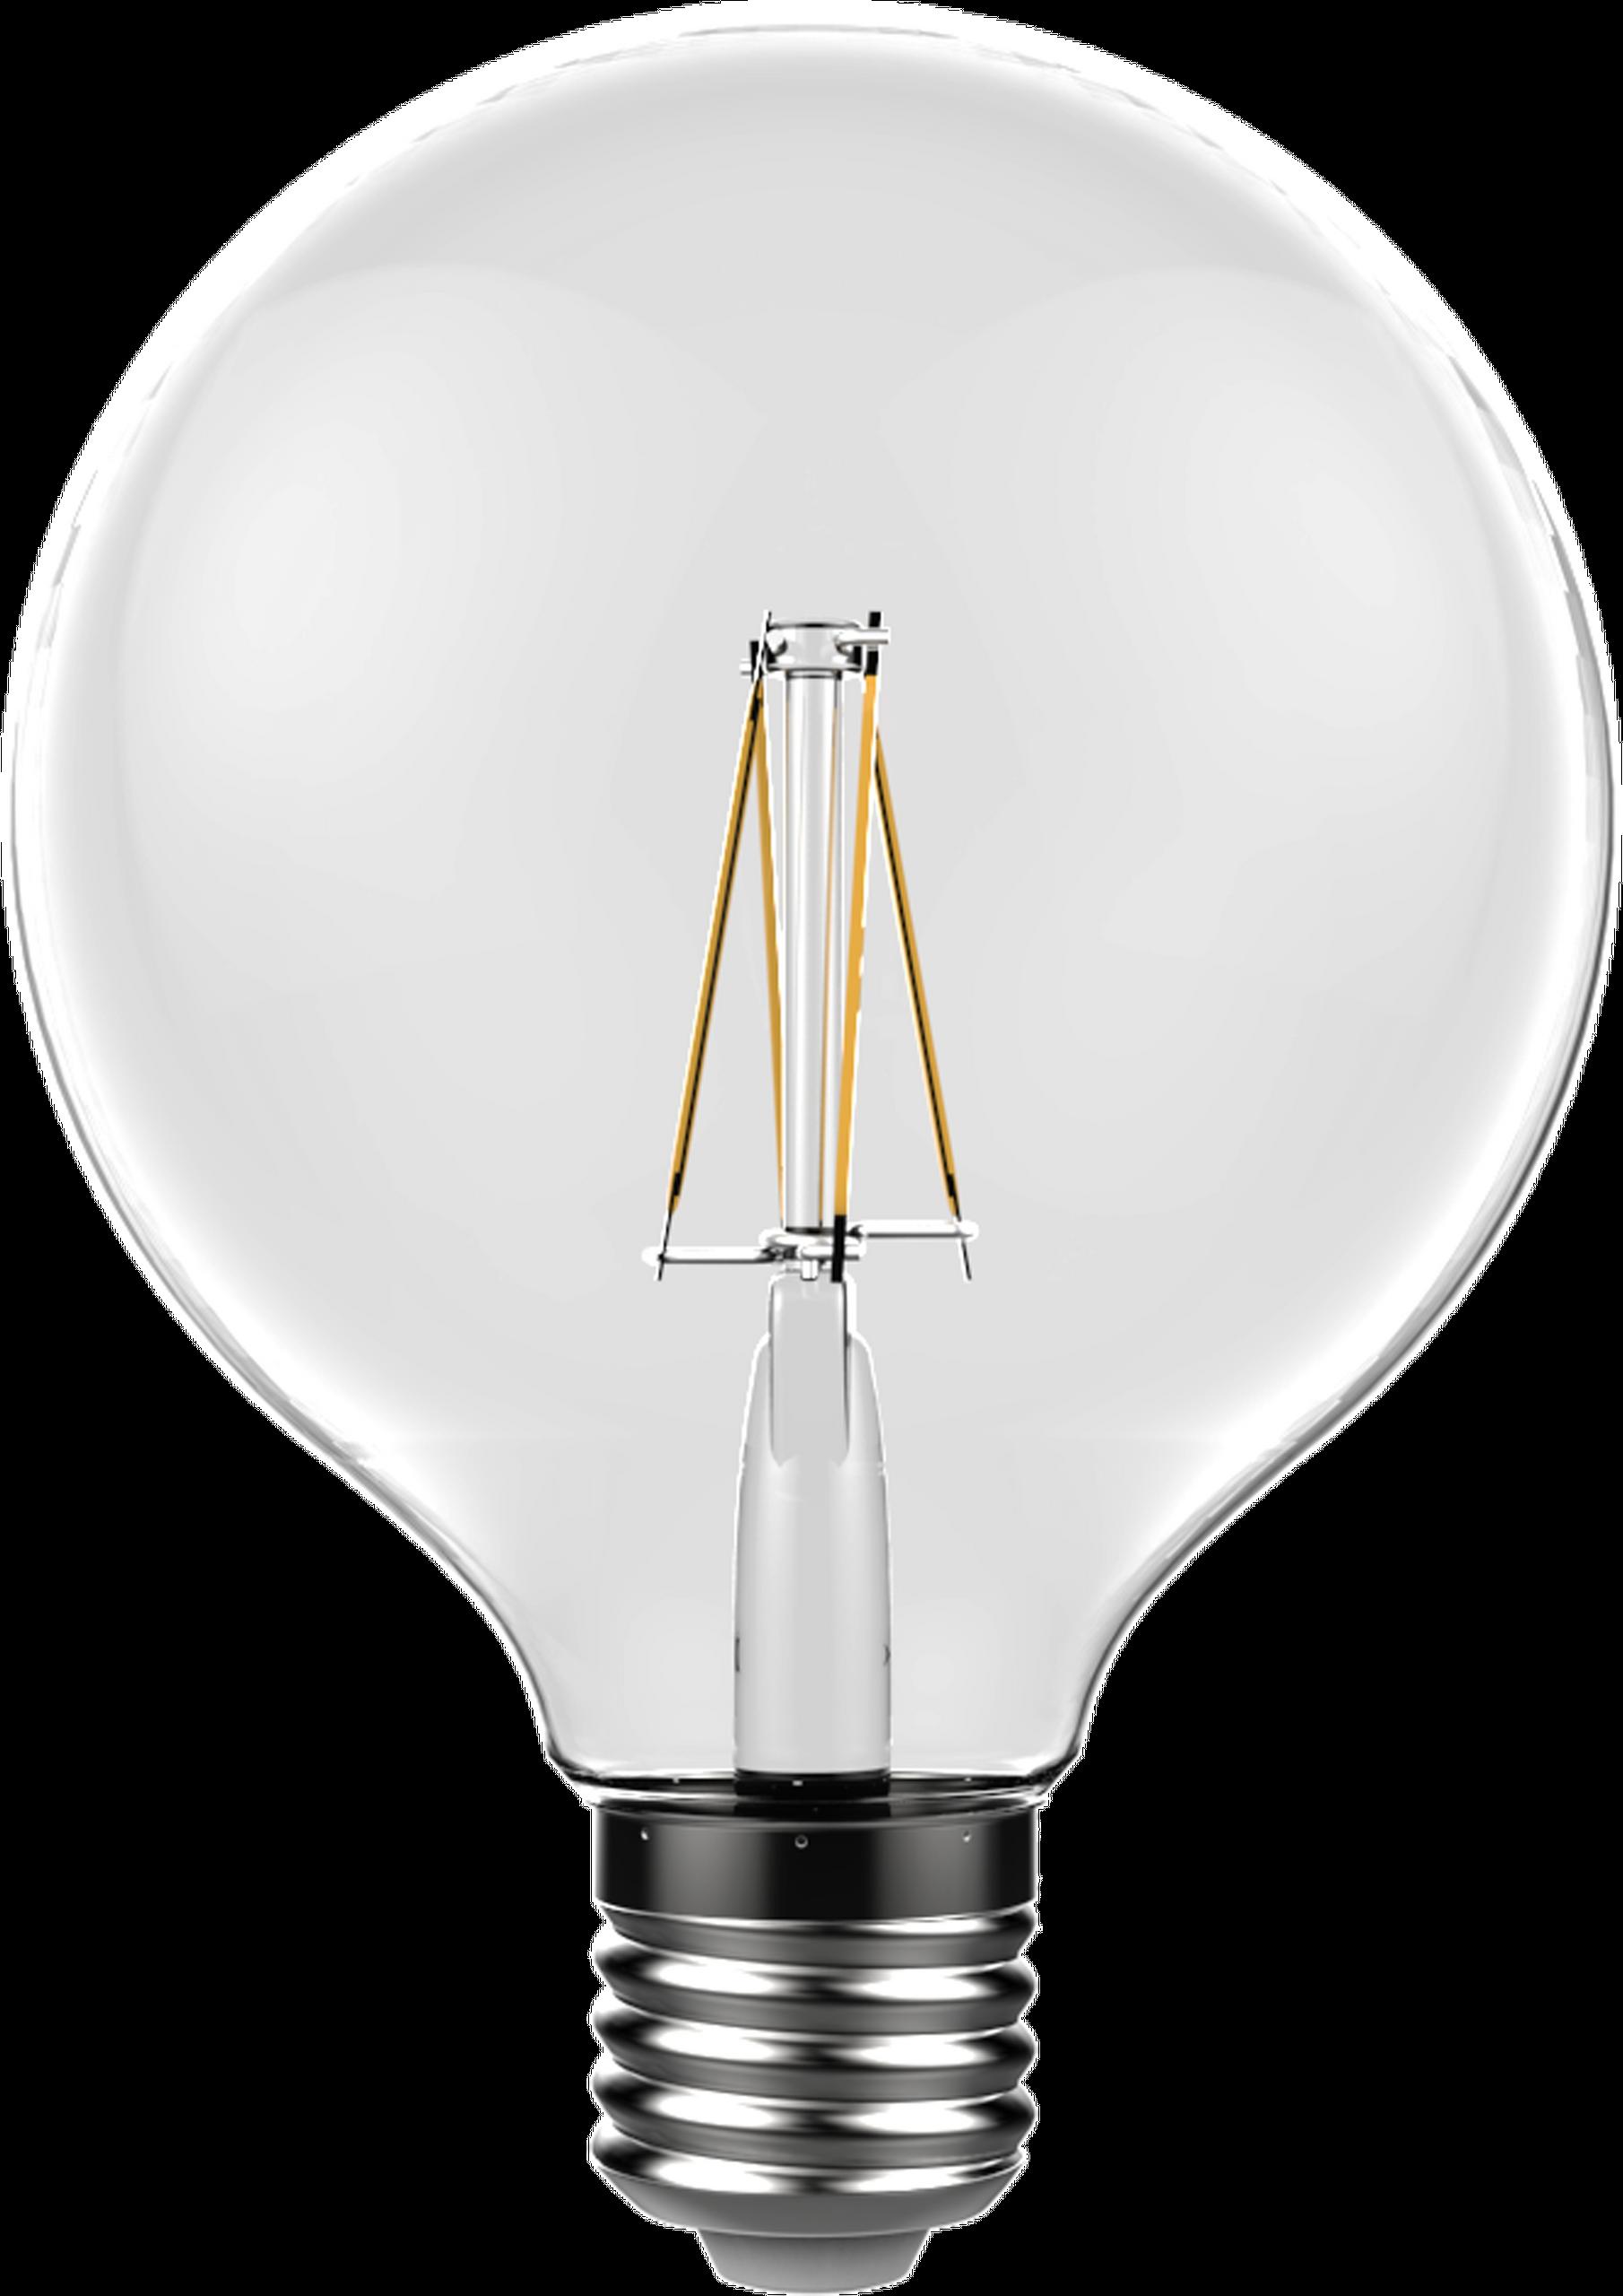 G125-E27 Spannende Welche Lampen Sind Dimmbar Dekorationen